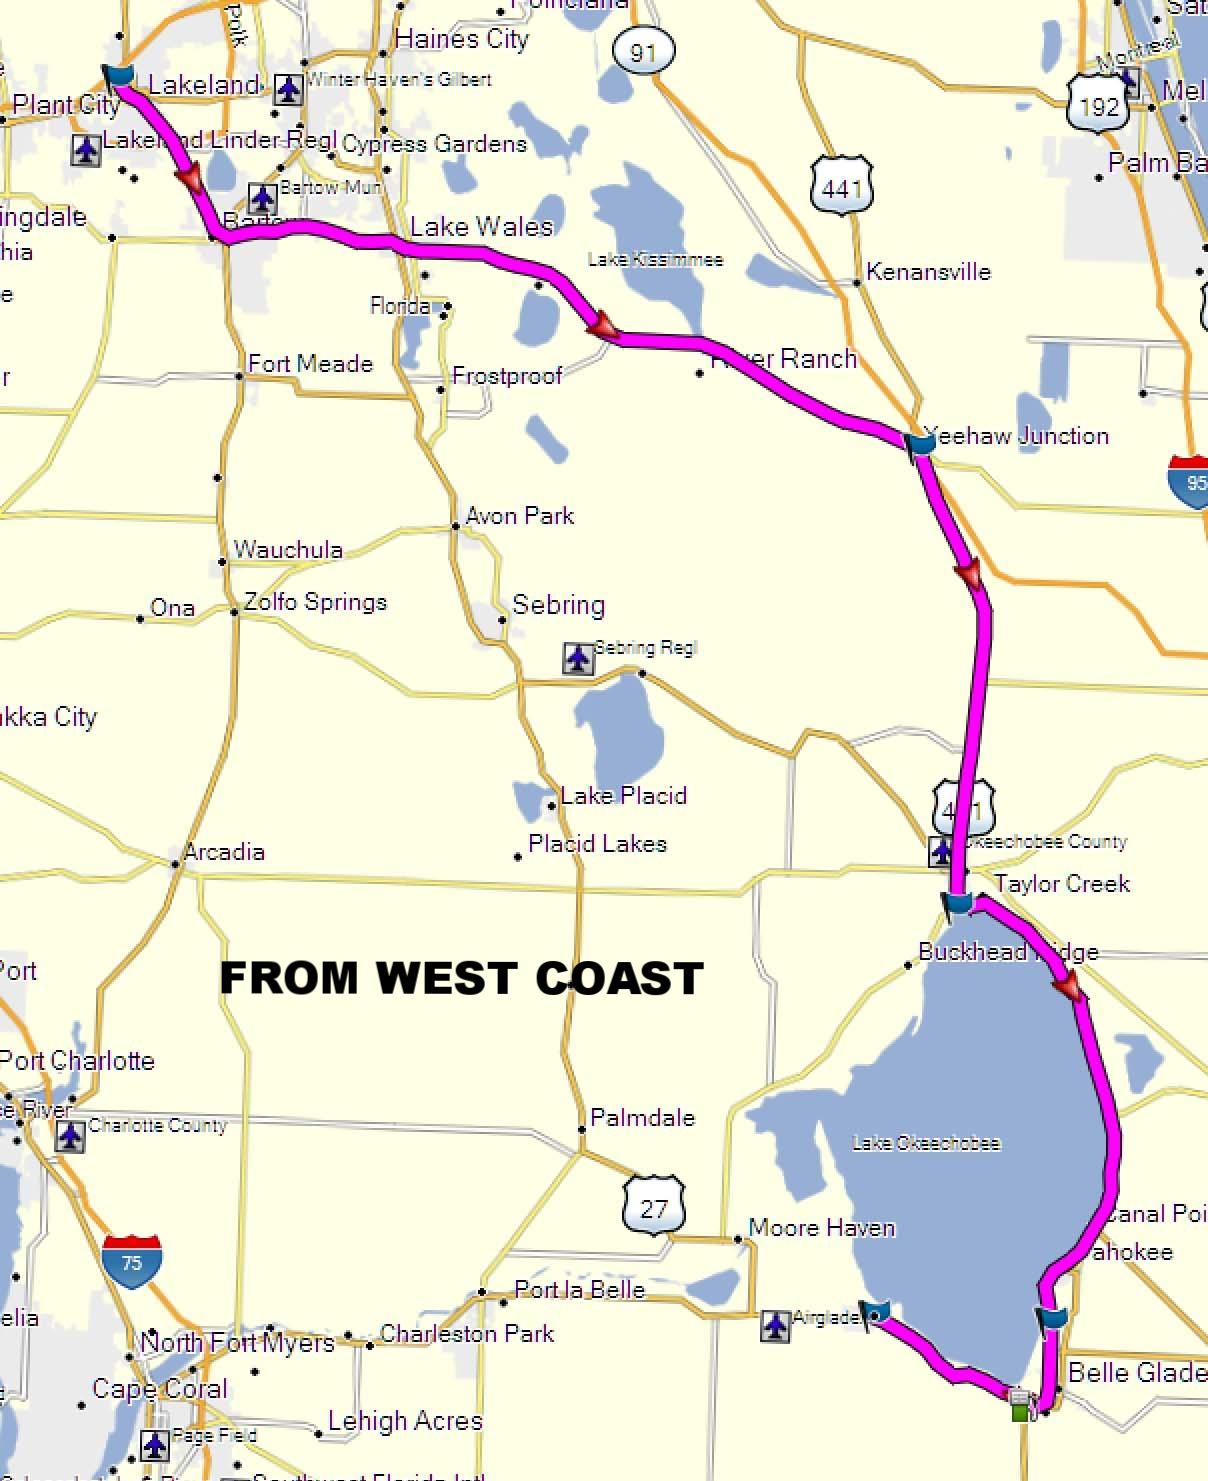 West Coast Chapter Map to Scotty's Tiki Bar Clewiston FL.jpg